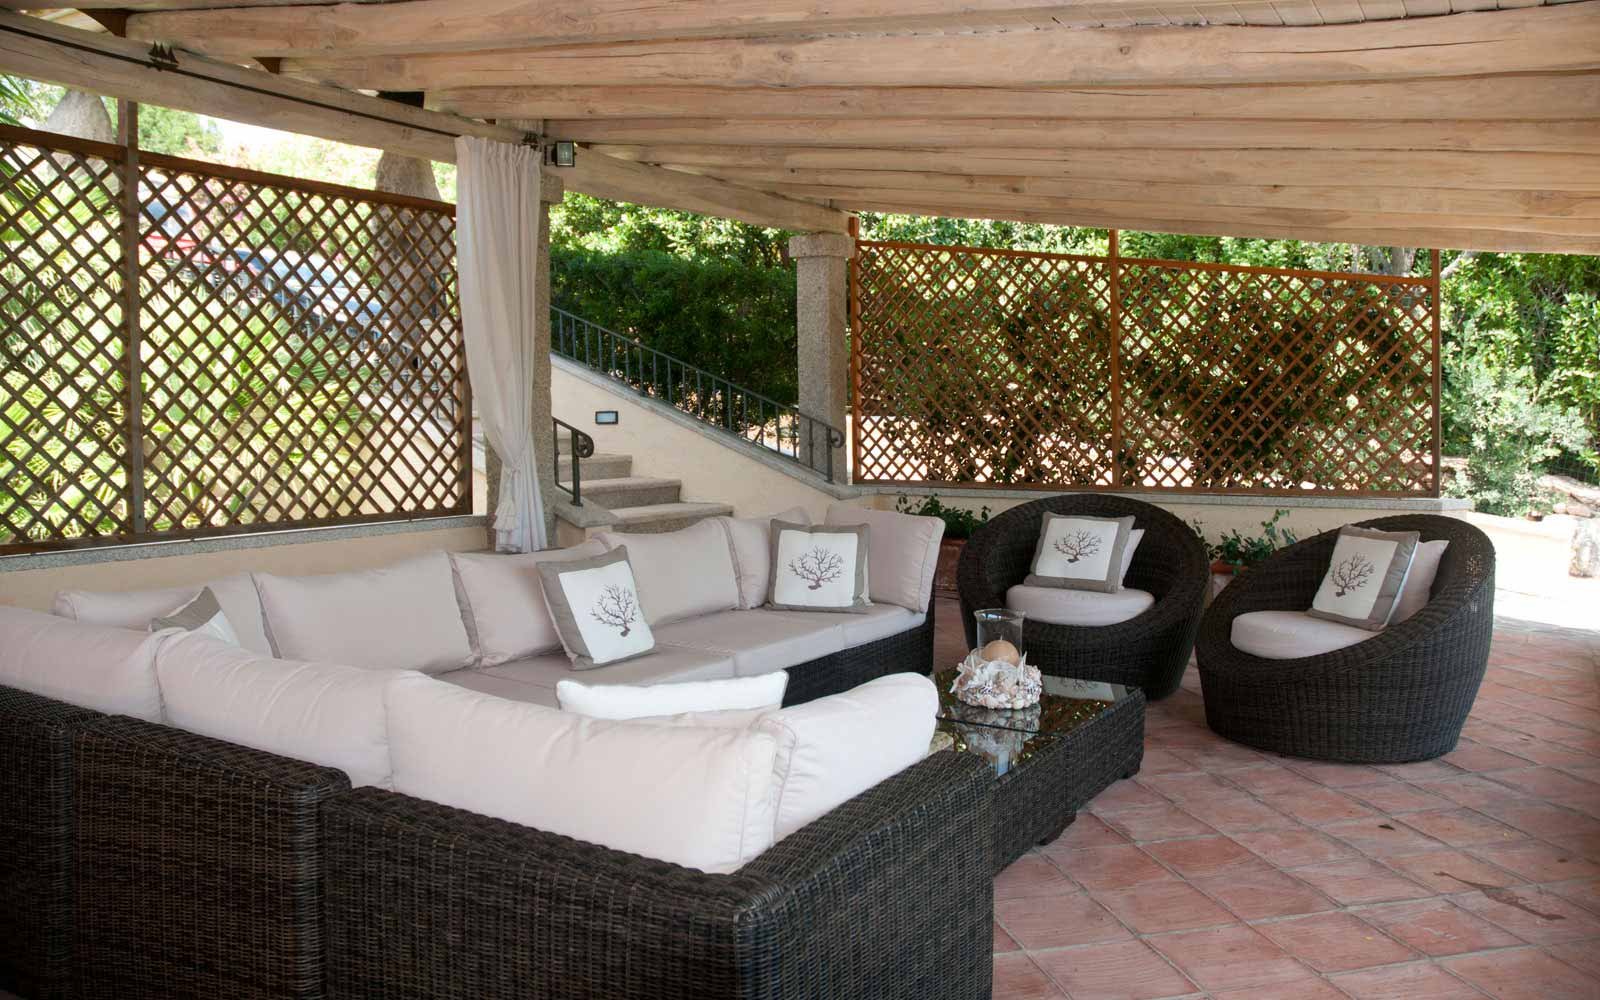 The Veranda at Villa Pedrabianca